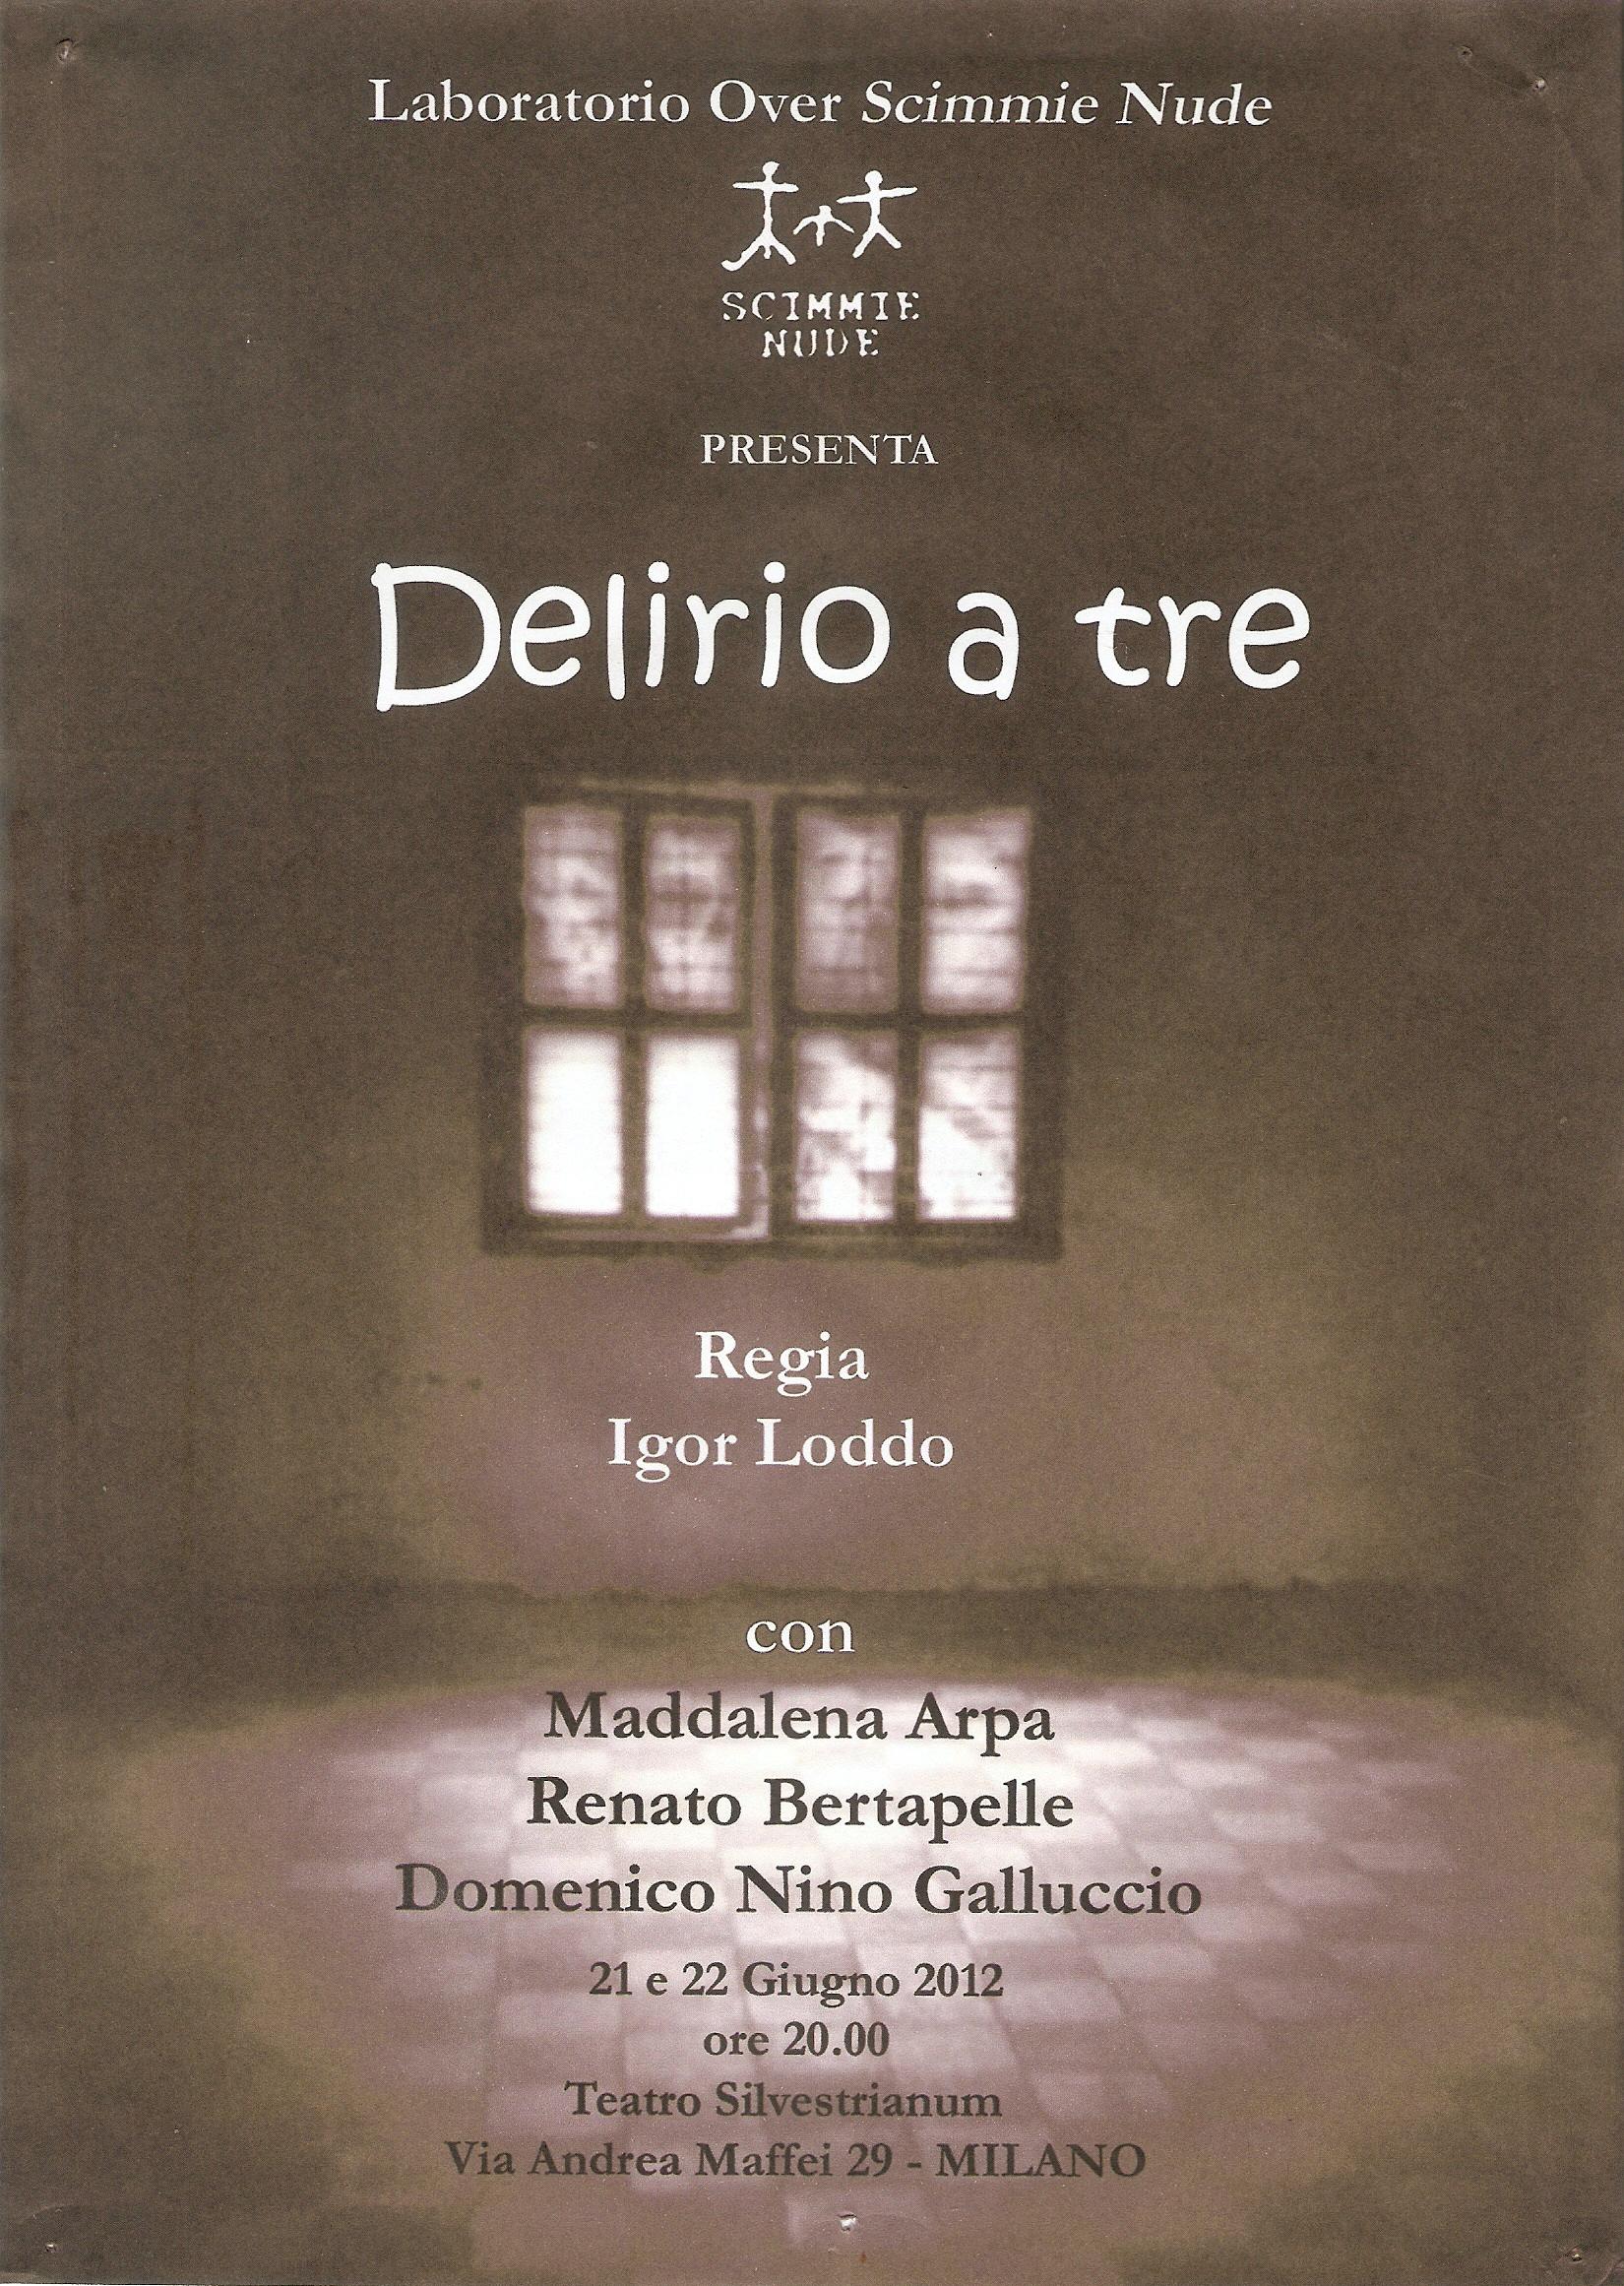 Delirio-a-tre-2011_20121